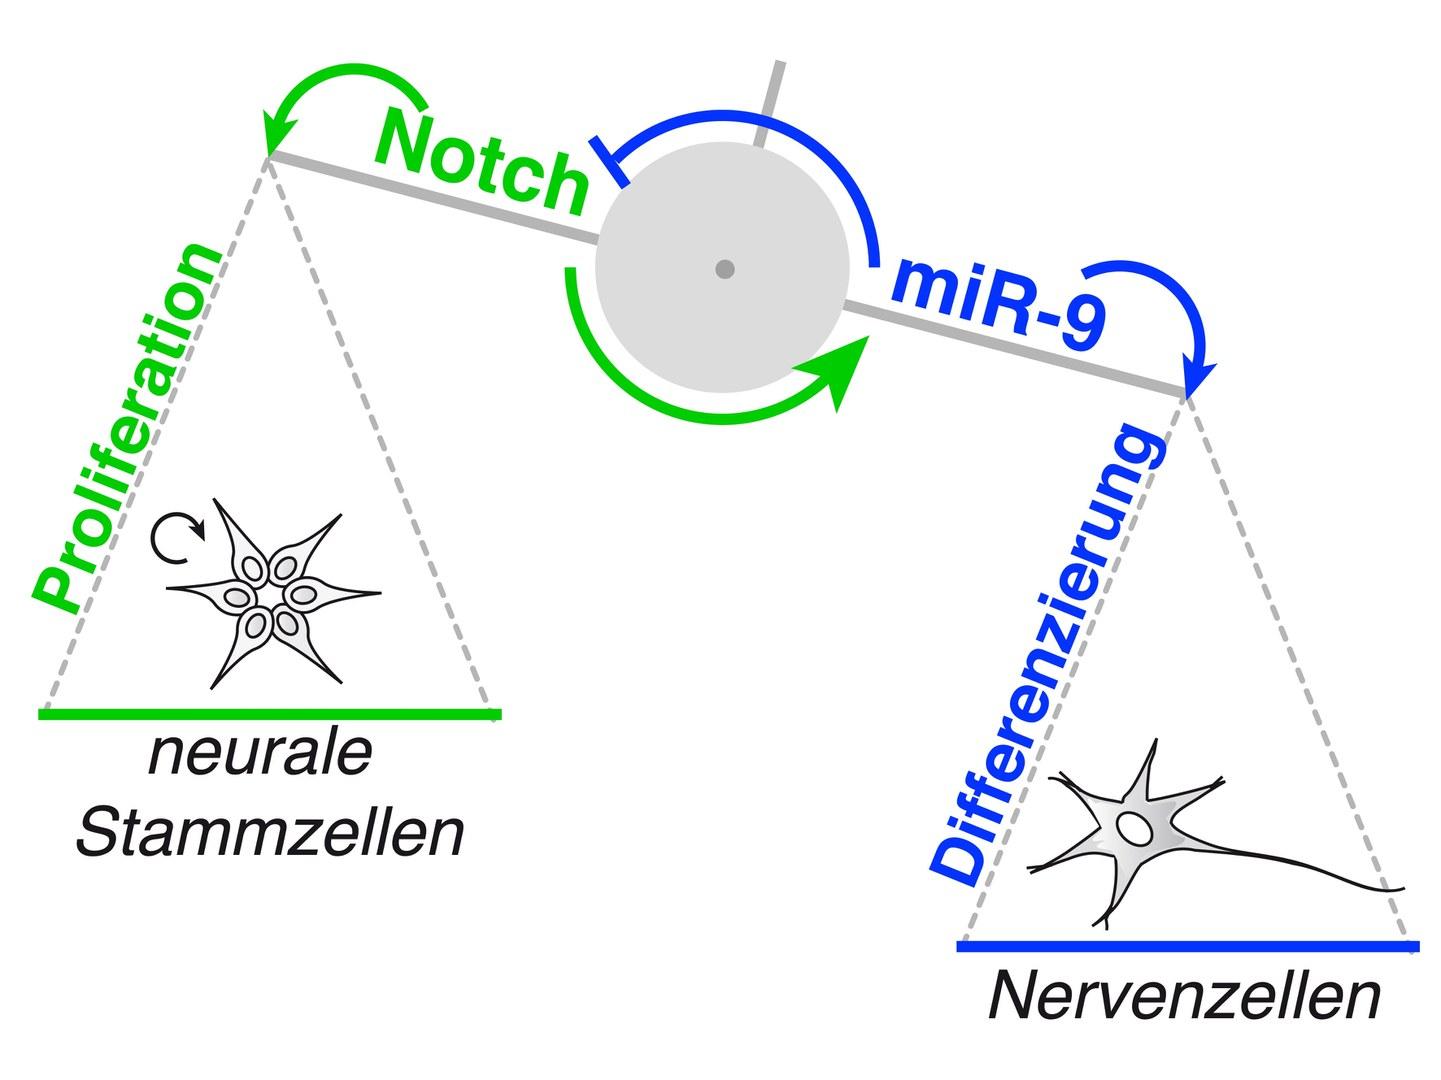 Notch_miR9_Interaktion.jpg